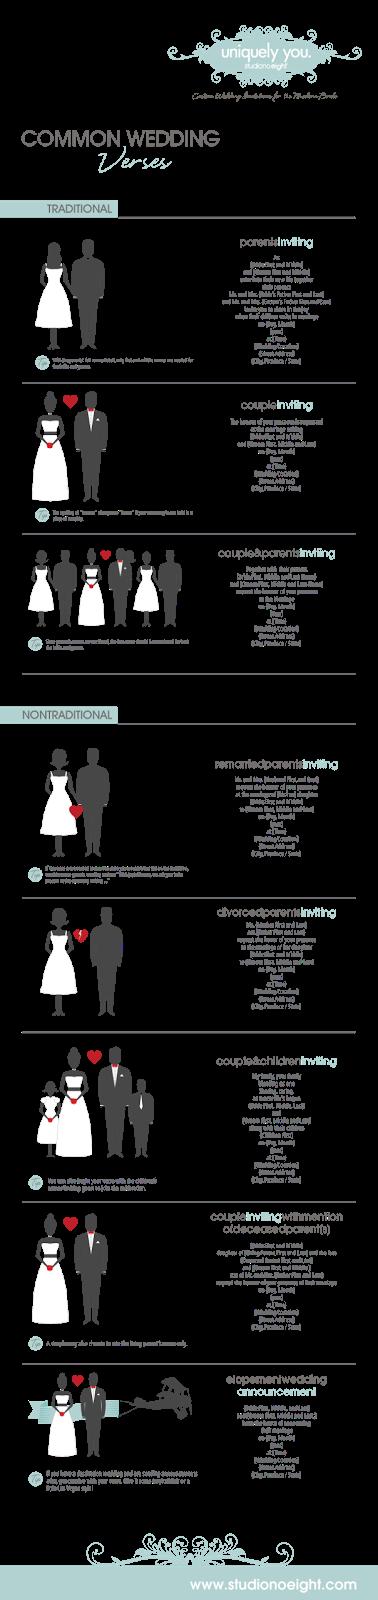 Studiono8 Wedding Invitations And Pricing